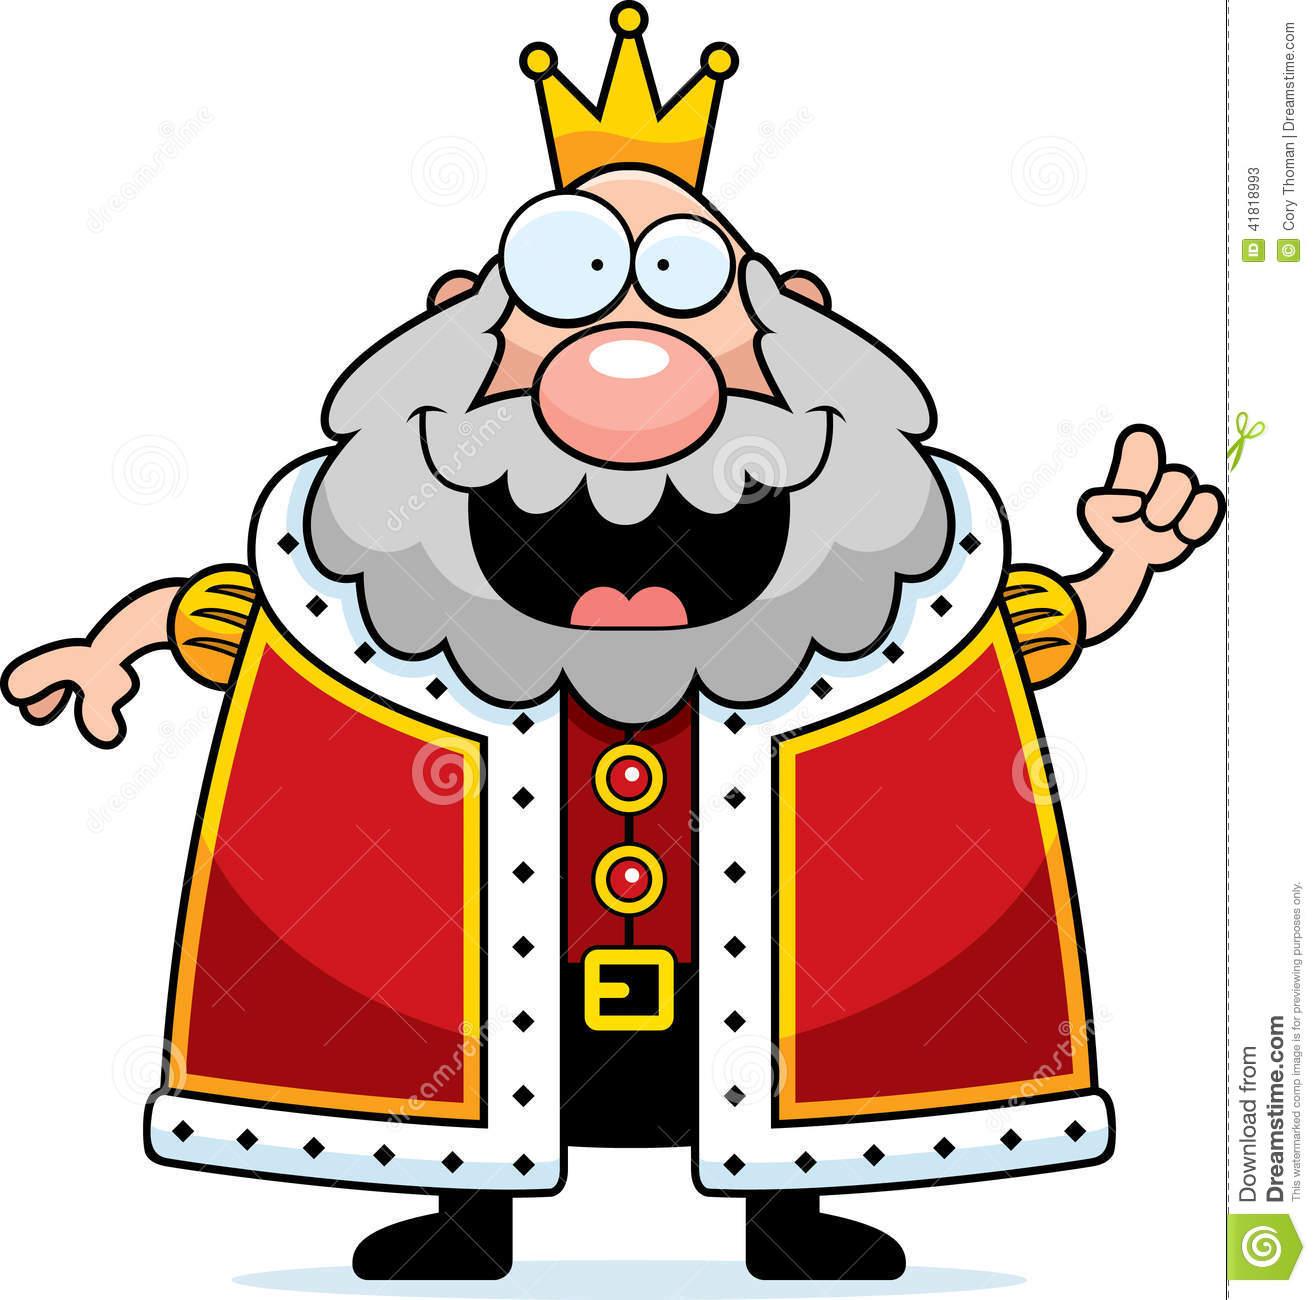 Clipart king jpg freeuse stock clipart king | Clipart jpg freeuse stock